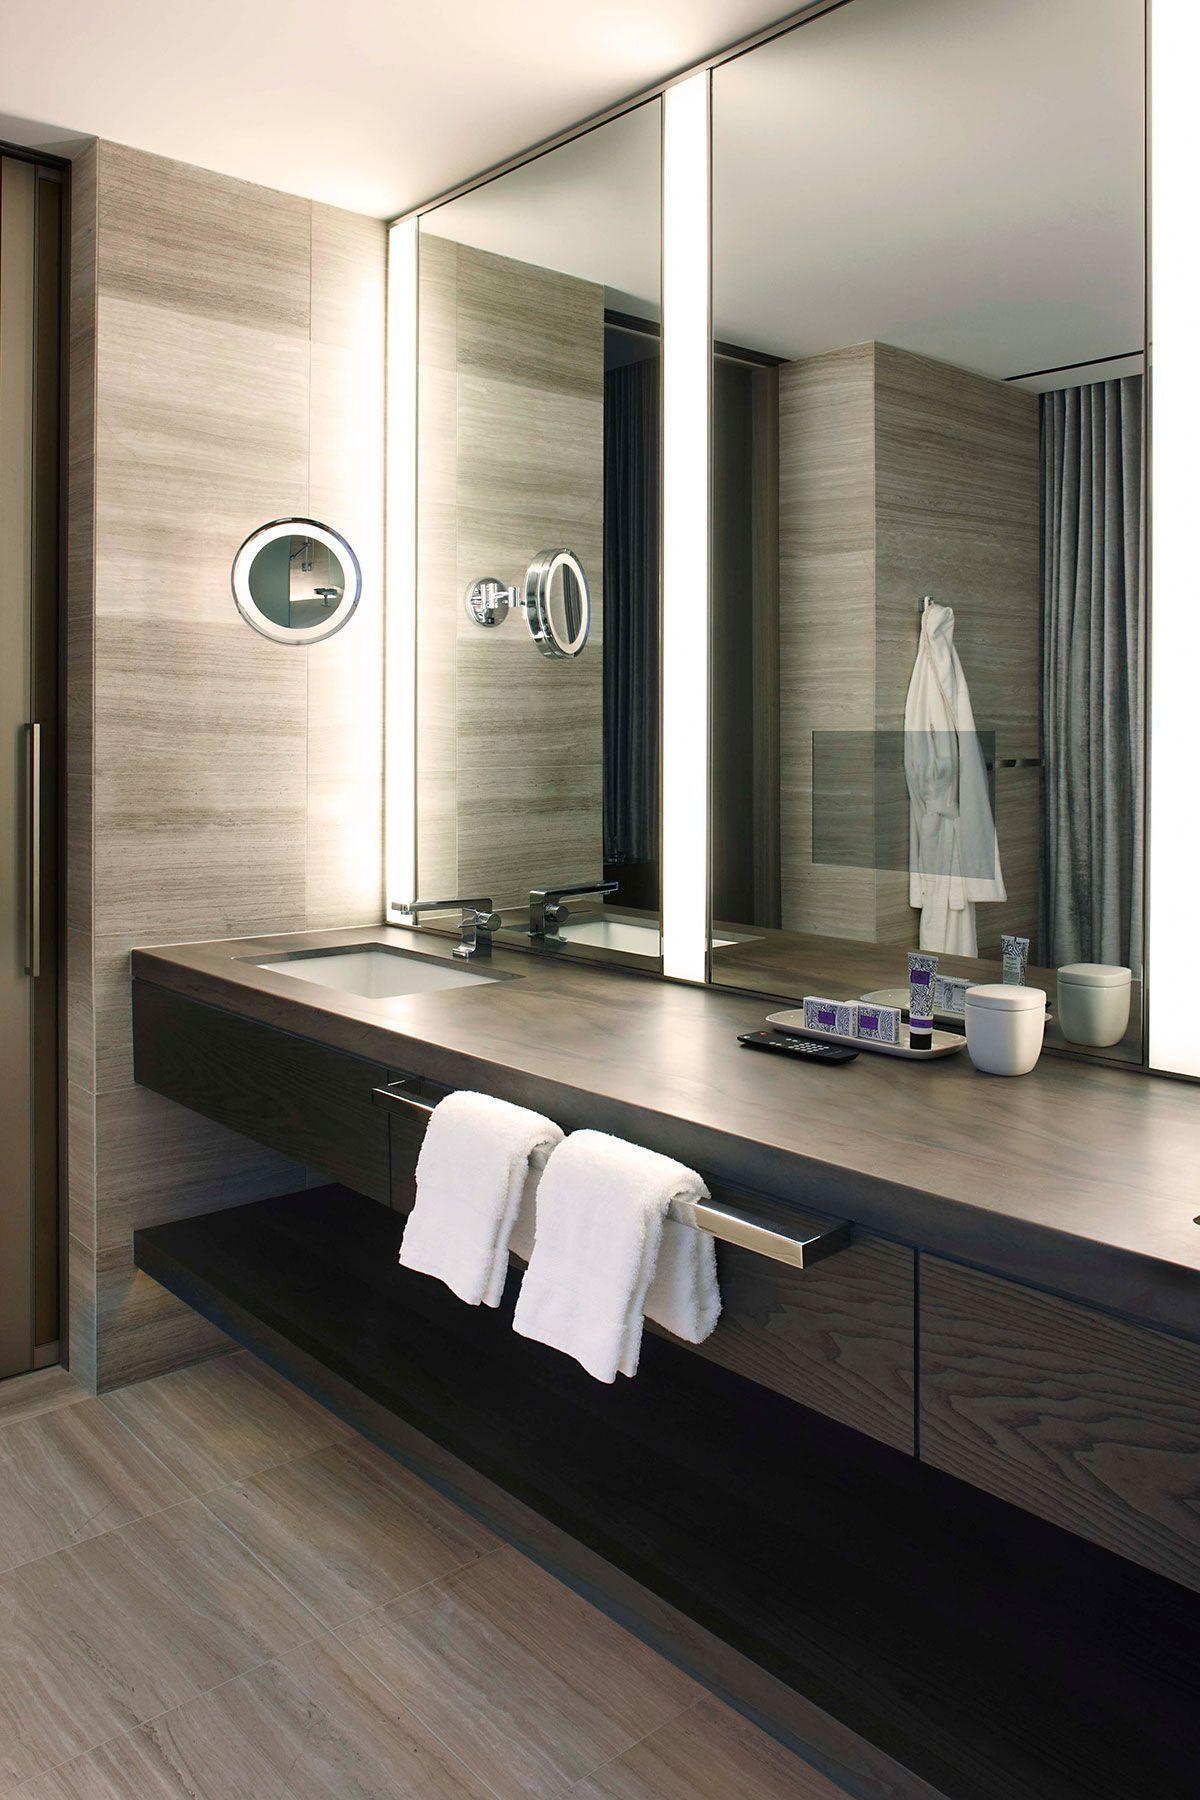 Diy vanity mirror ideas to make your room more beautiful tags diy